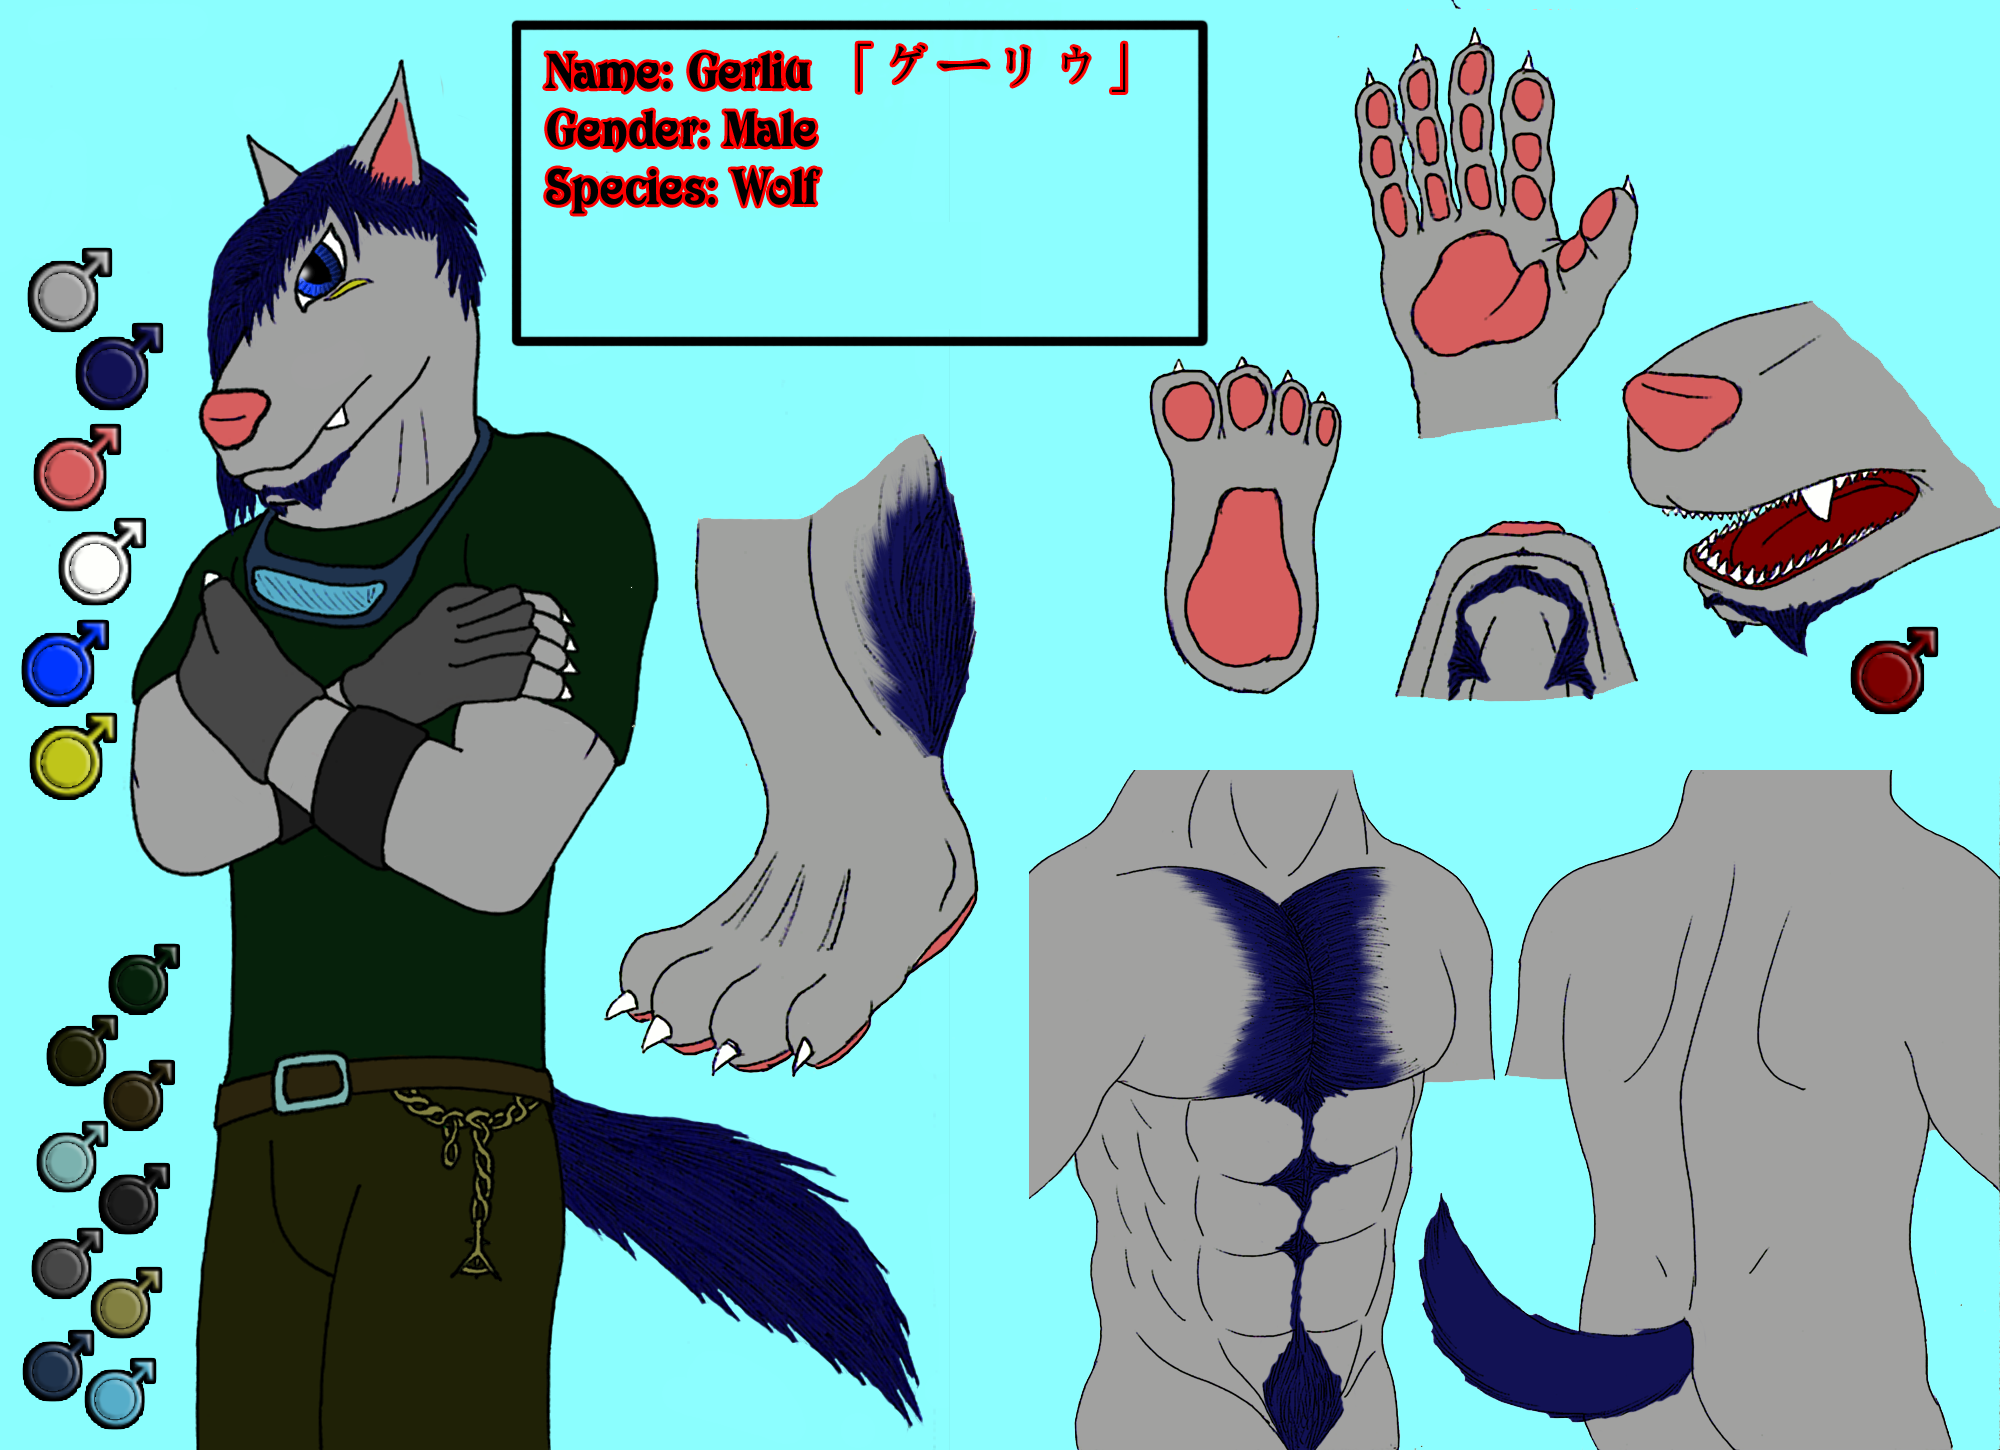 Character Sheet - Gerliu